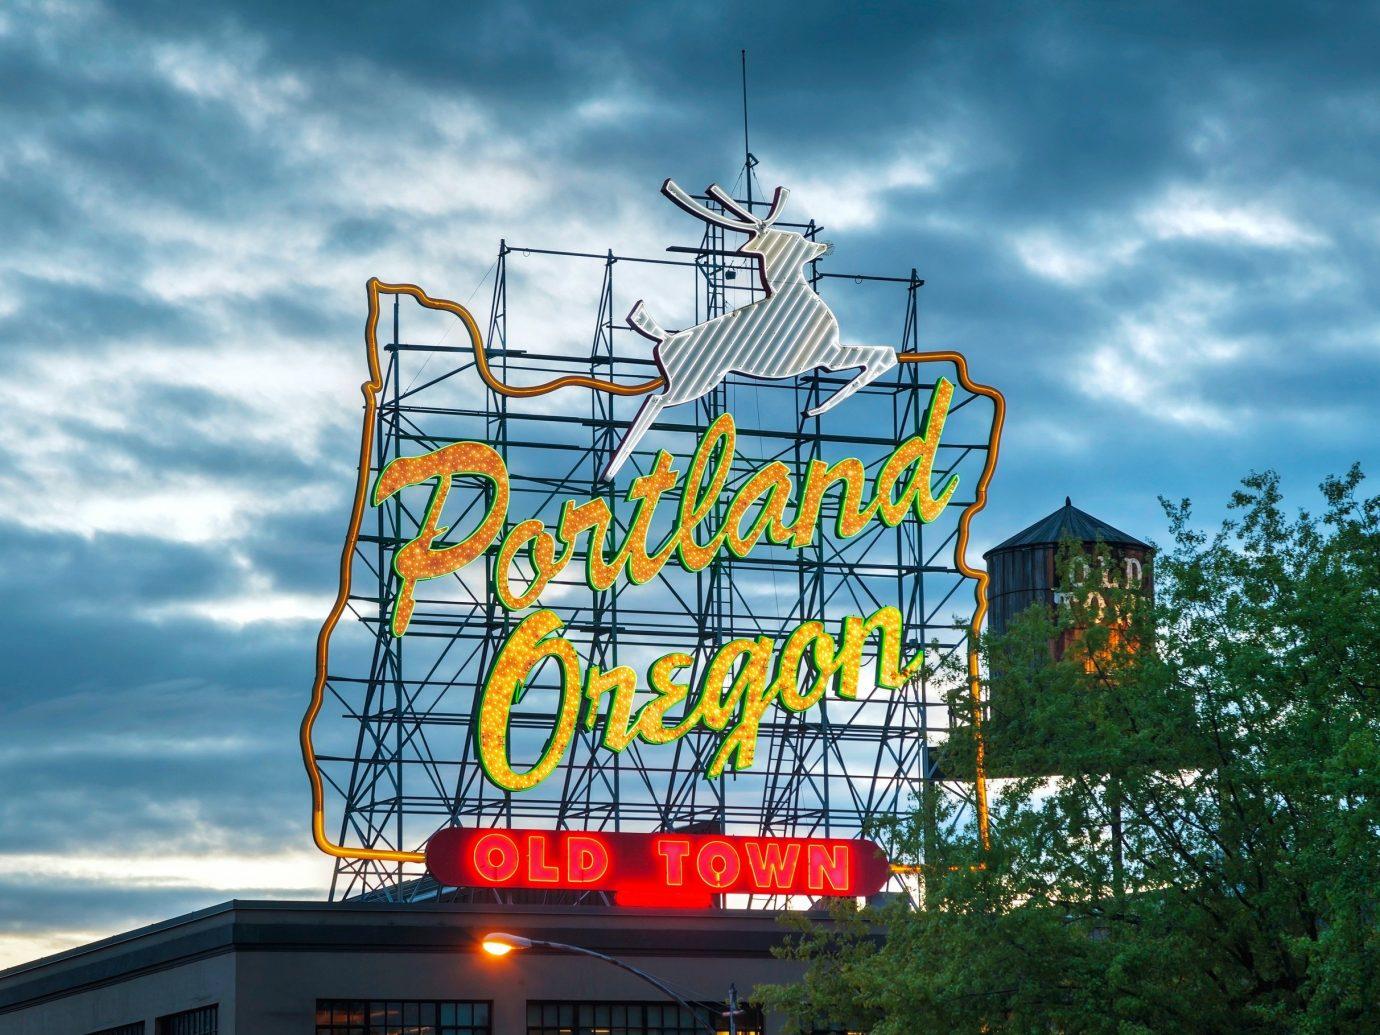 Budget sky outdoor text sign landmark urban area amusement park park tower